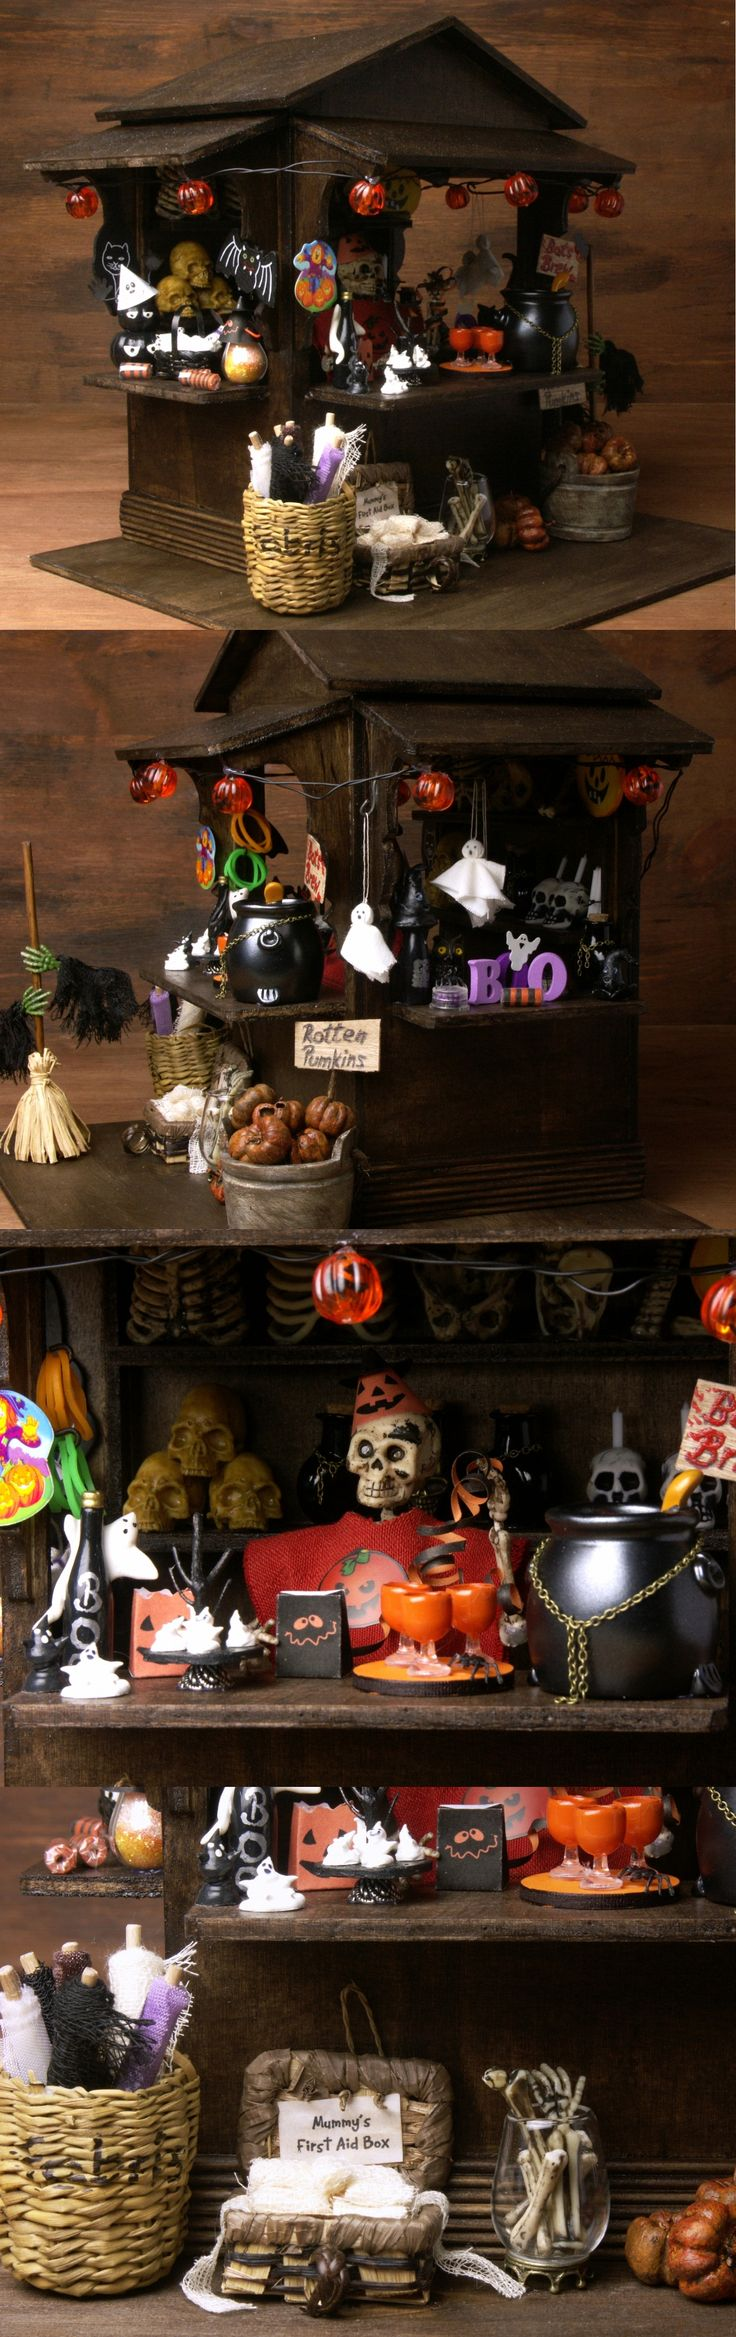 Illuminated Little Halloween Shop for your Miniature Scene by DinkyWorld on Etsy